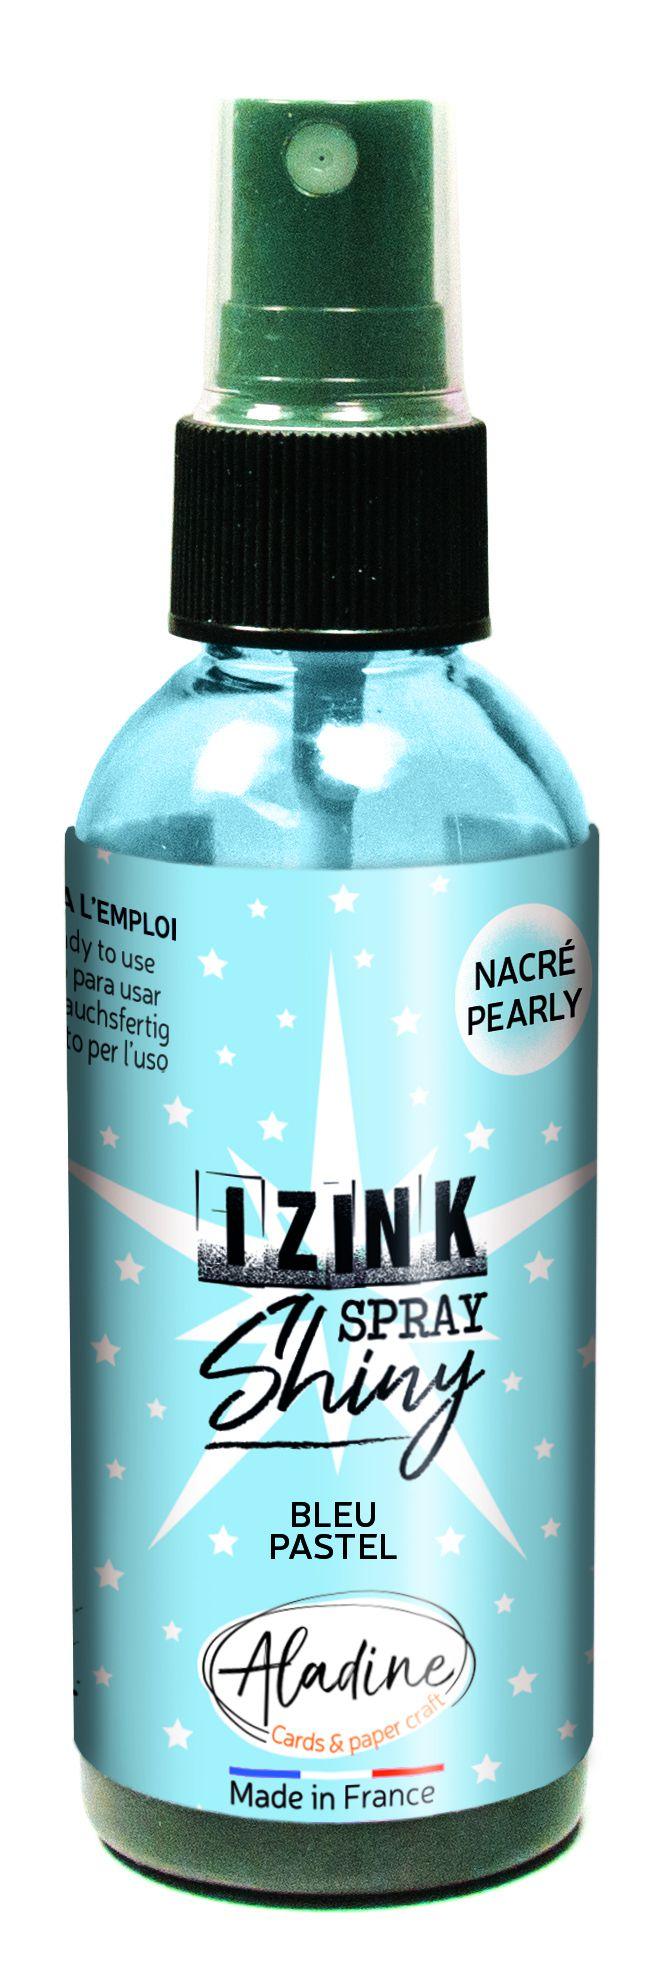 ENCRE IZINK AUX REFLETS NACRES - Bleu Pastel